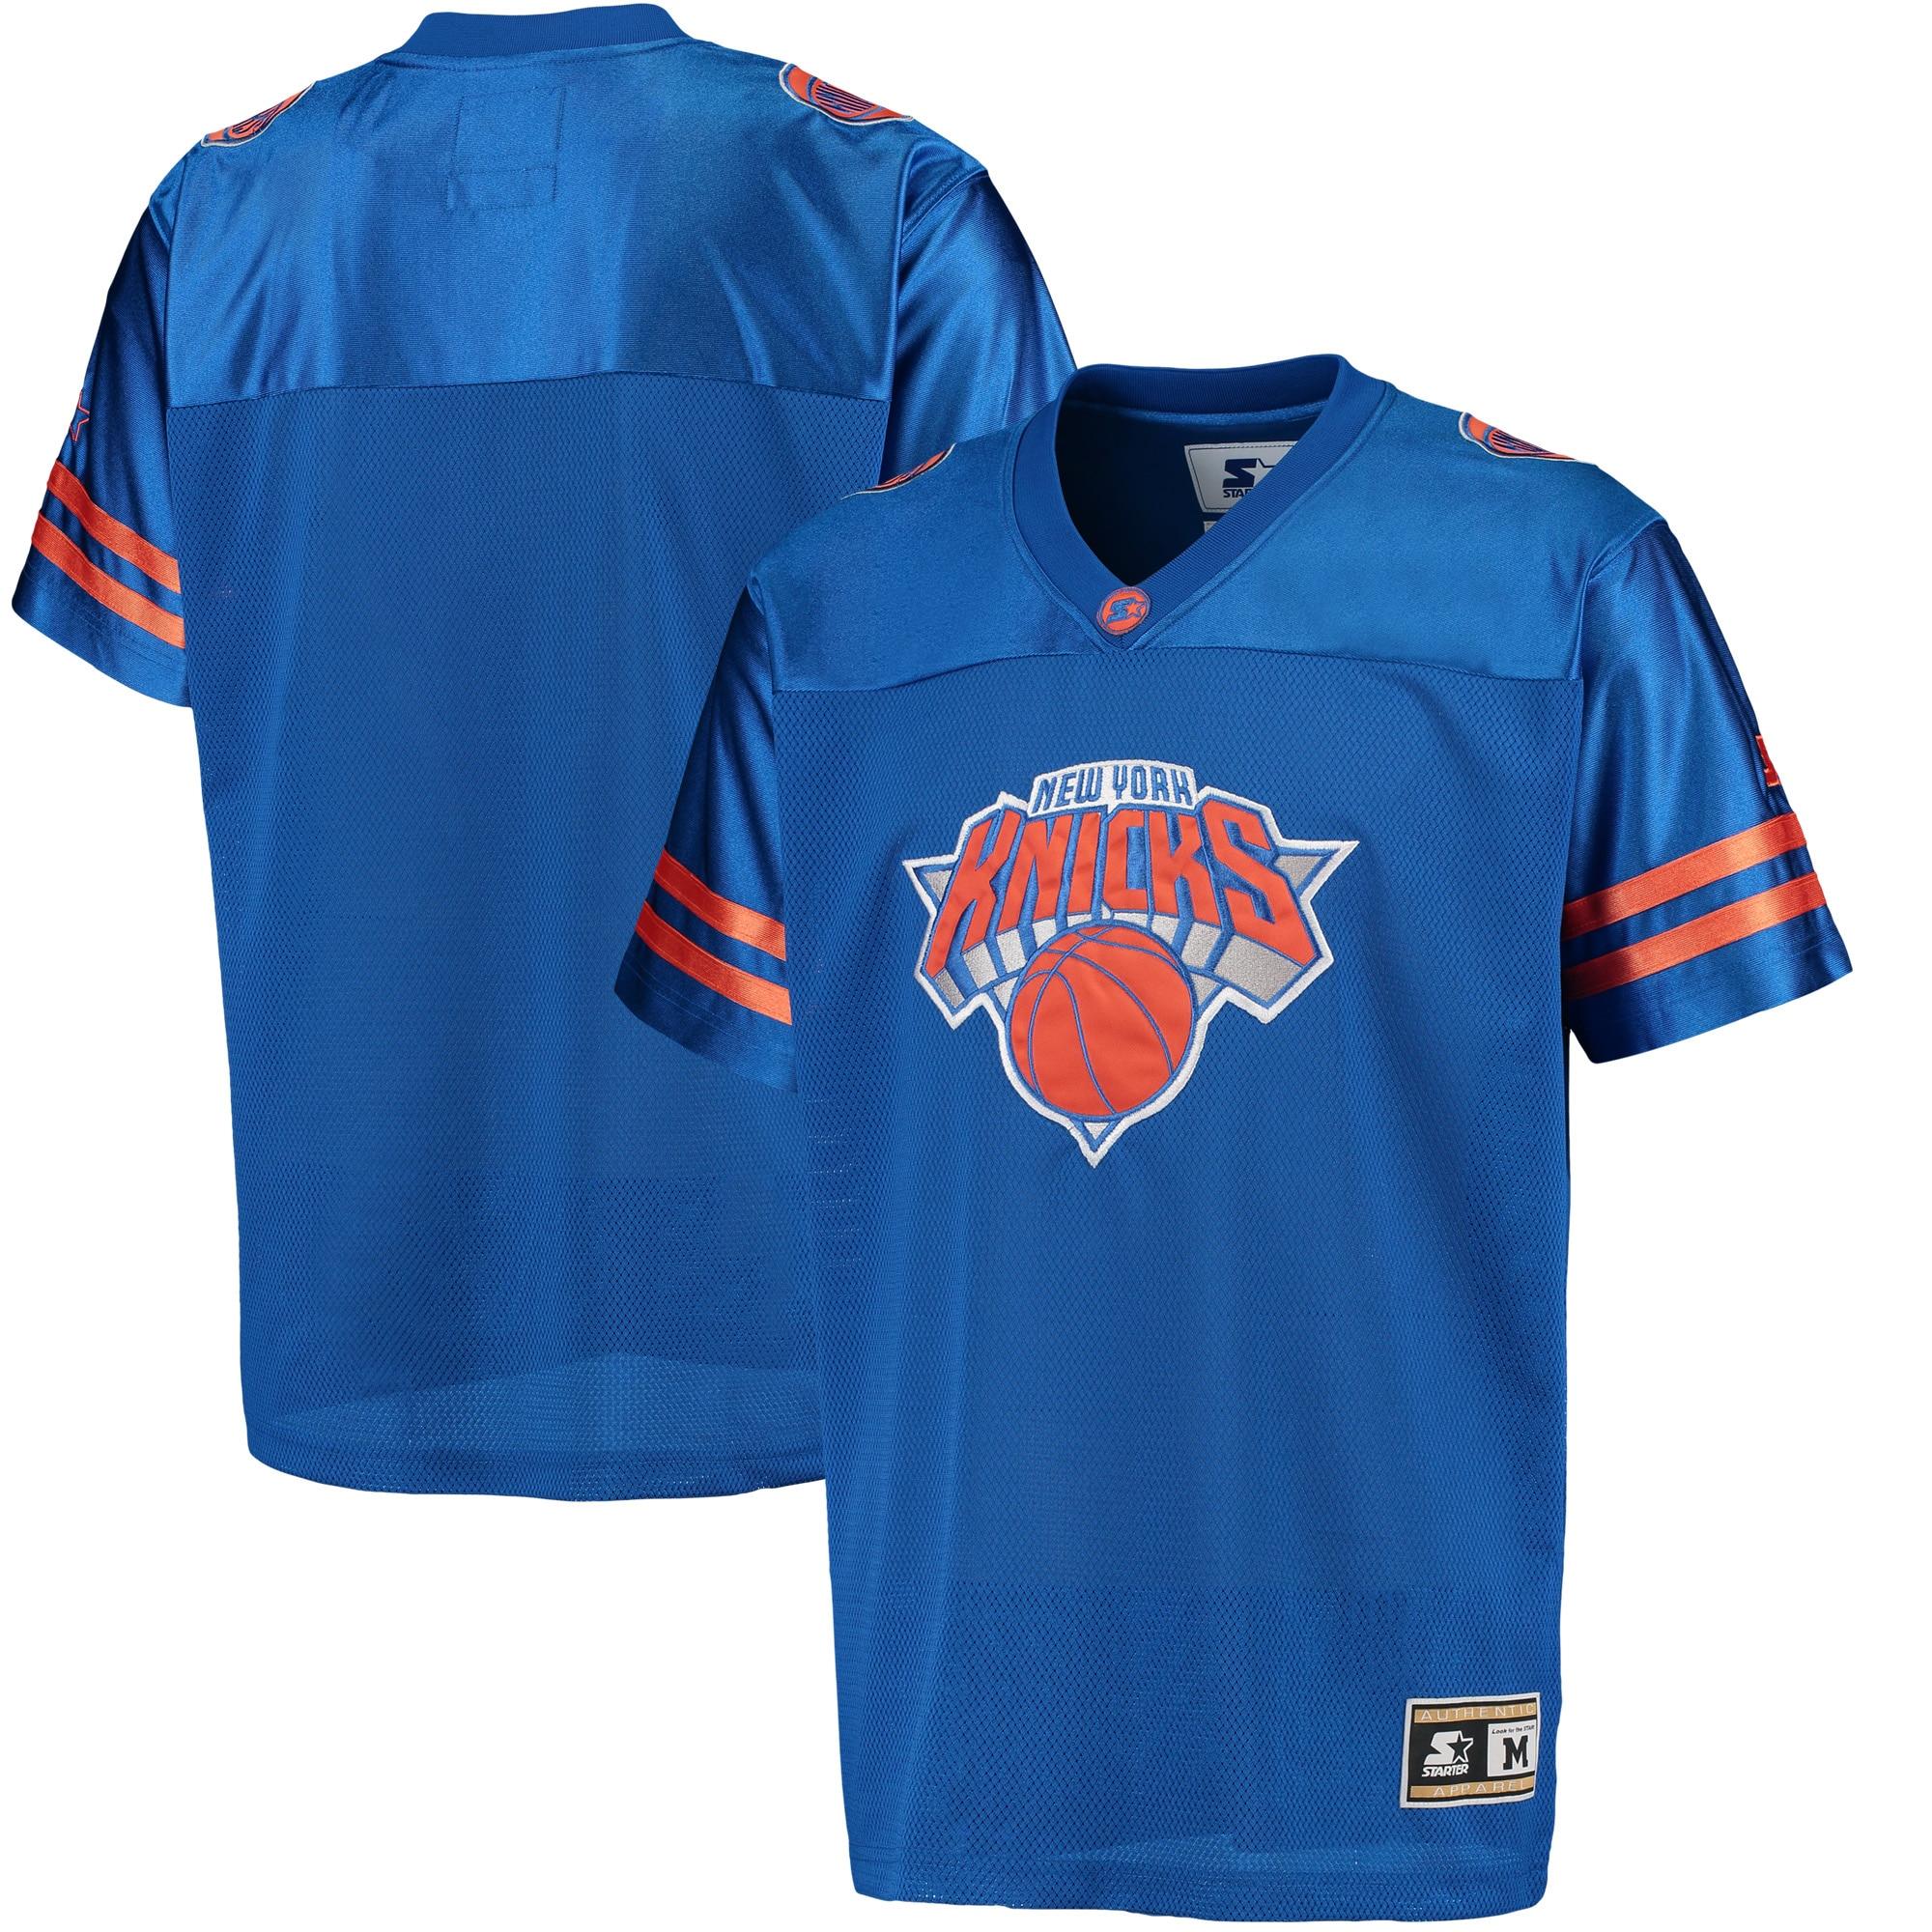 New York Knicks G-III Sports by Carl Banks Football Jersey - Royal